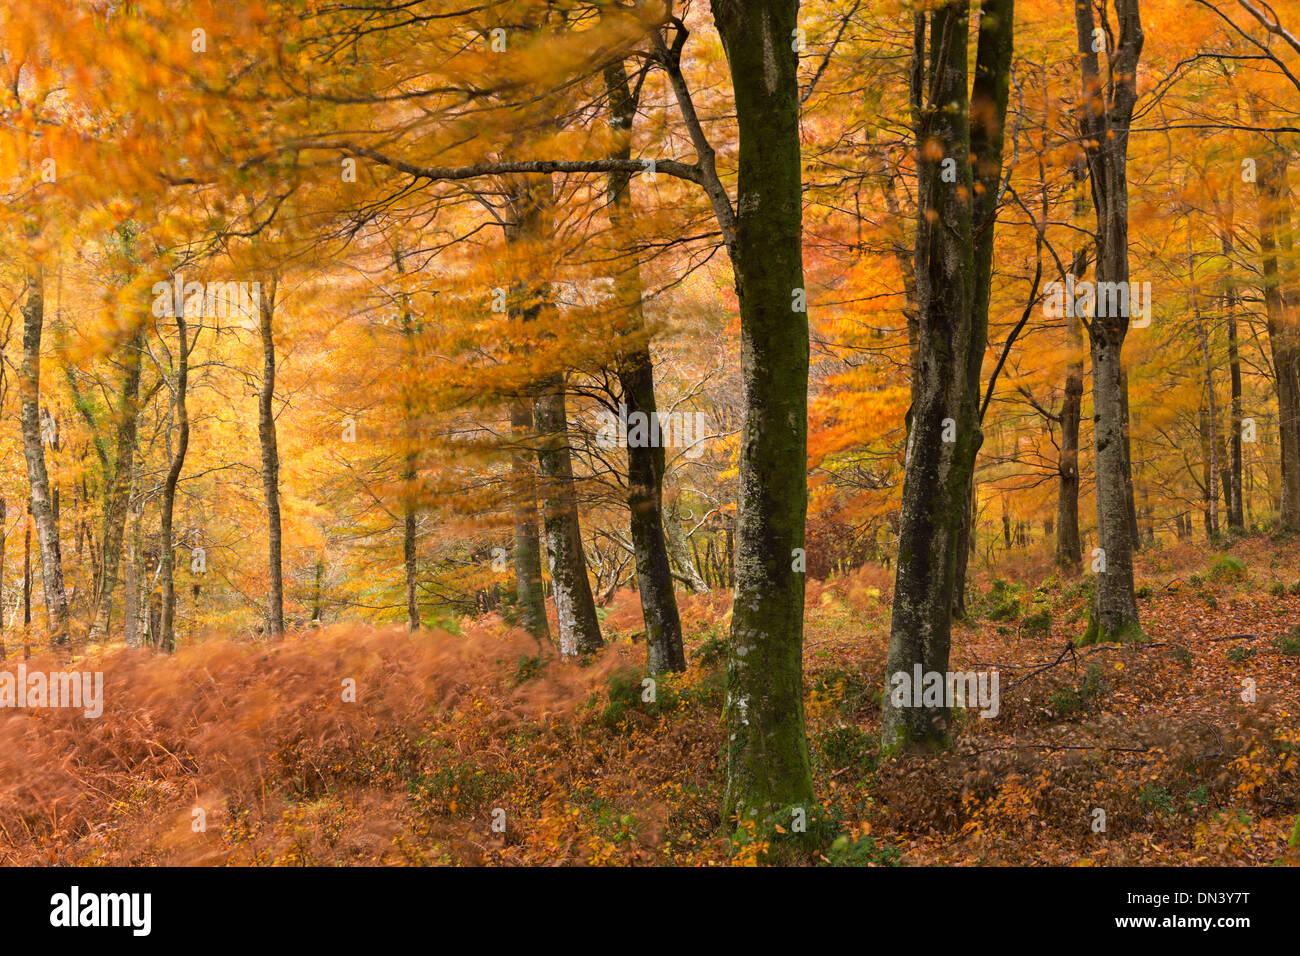 Autumn colours in deciduous woodland, Exmoor National Park, Devon, England. Autumn (November) 2013. - Stock Image